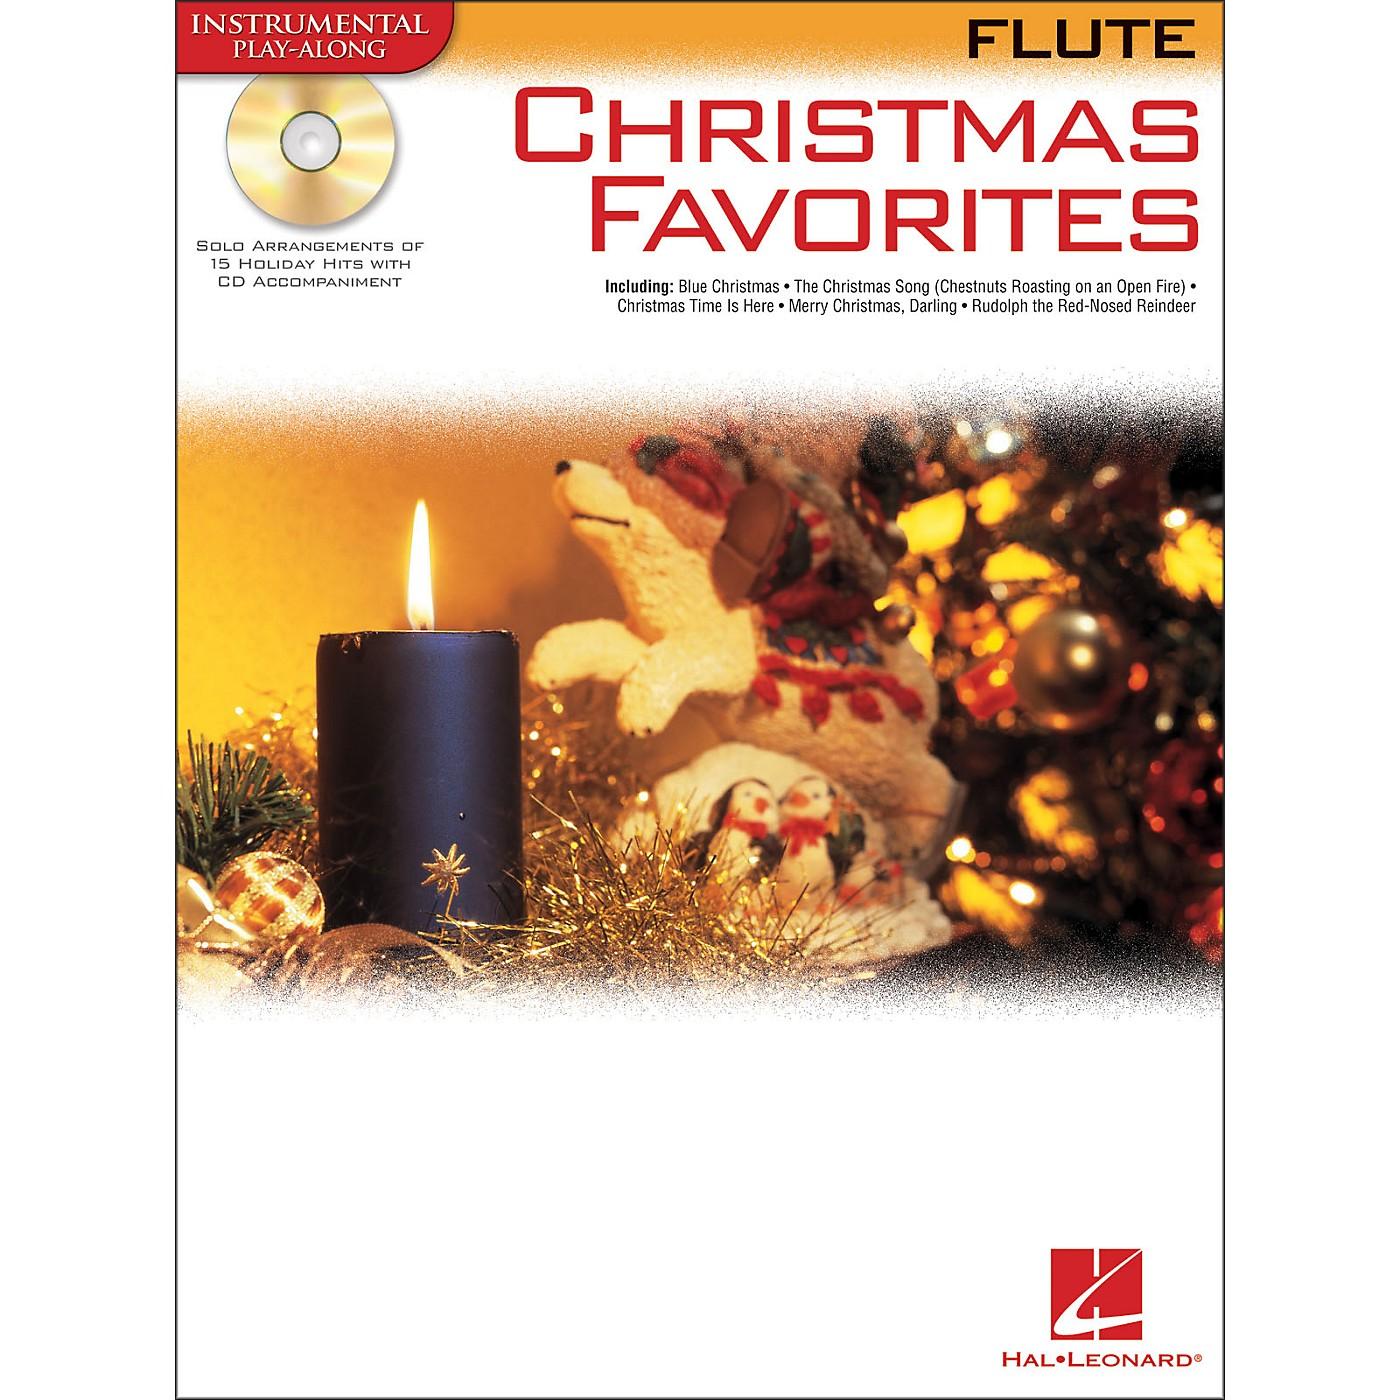 Hal Leonard Christmas Favorites for Flute Book/CD Instrumental Play-Along thumbnail